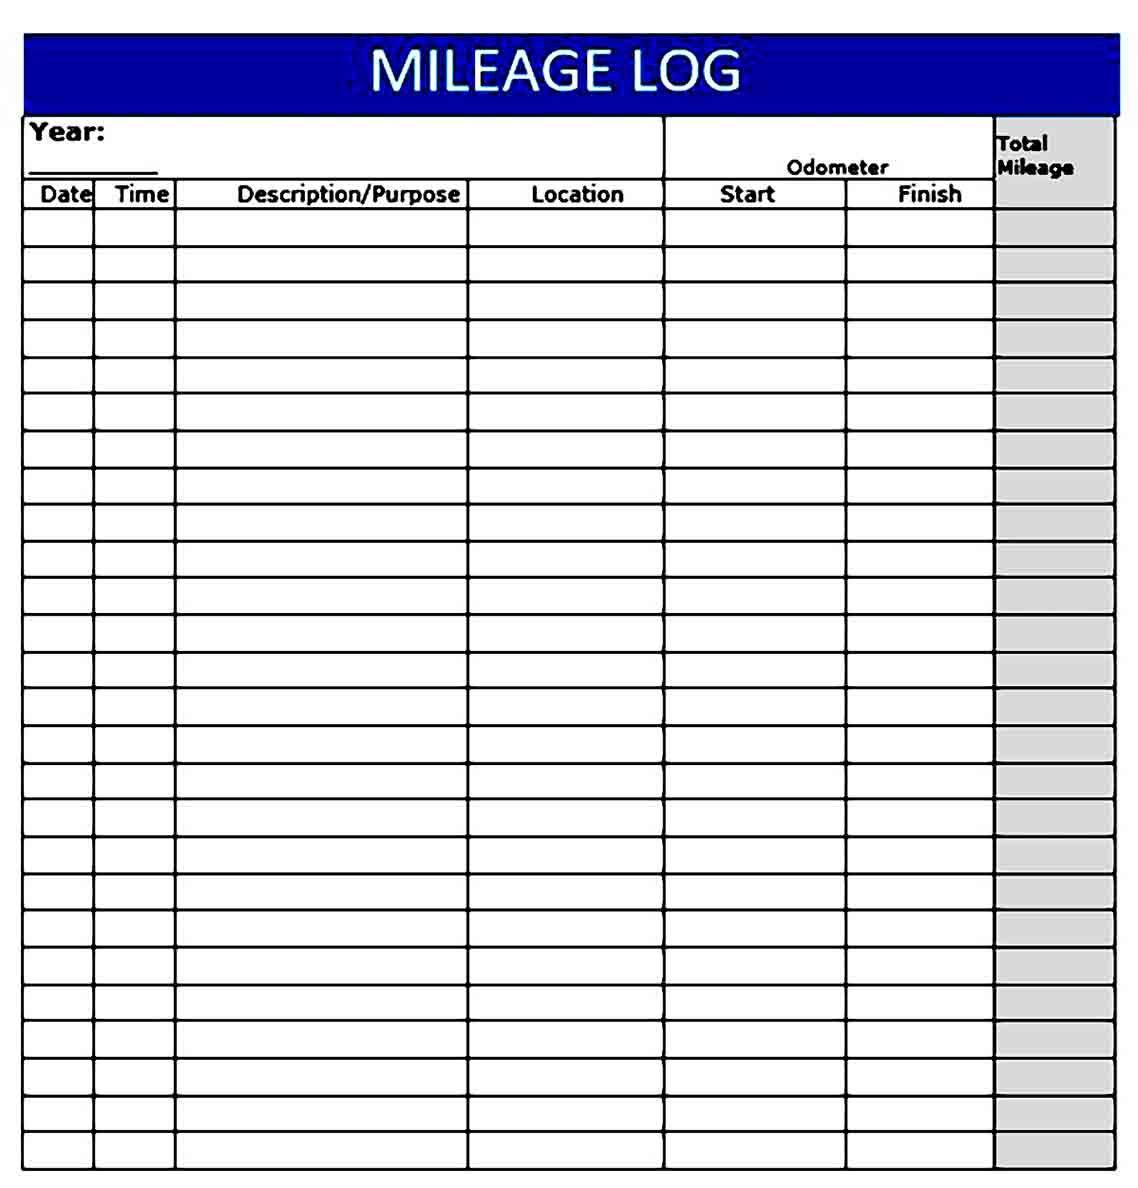 Mileage Reimbursement Form Template Lovely 13 Free Mileage Reimbursement Form Template Templates Lesson Plan Templates Survey Template